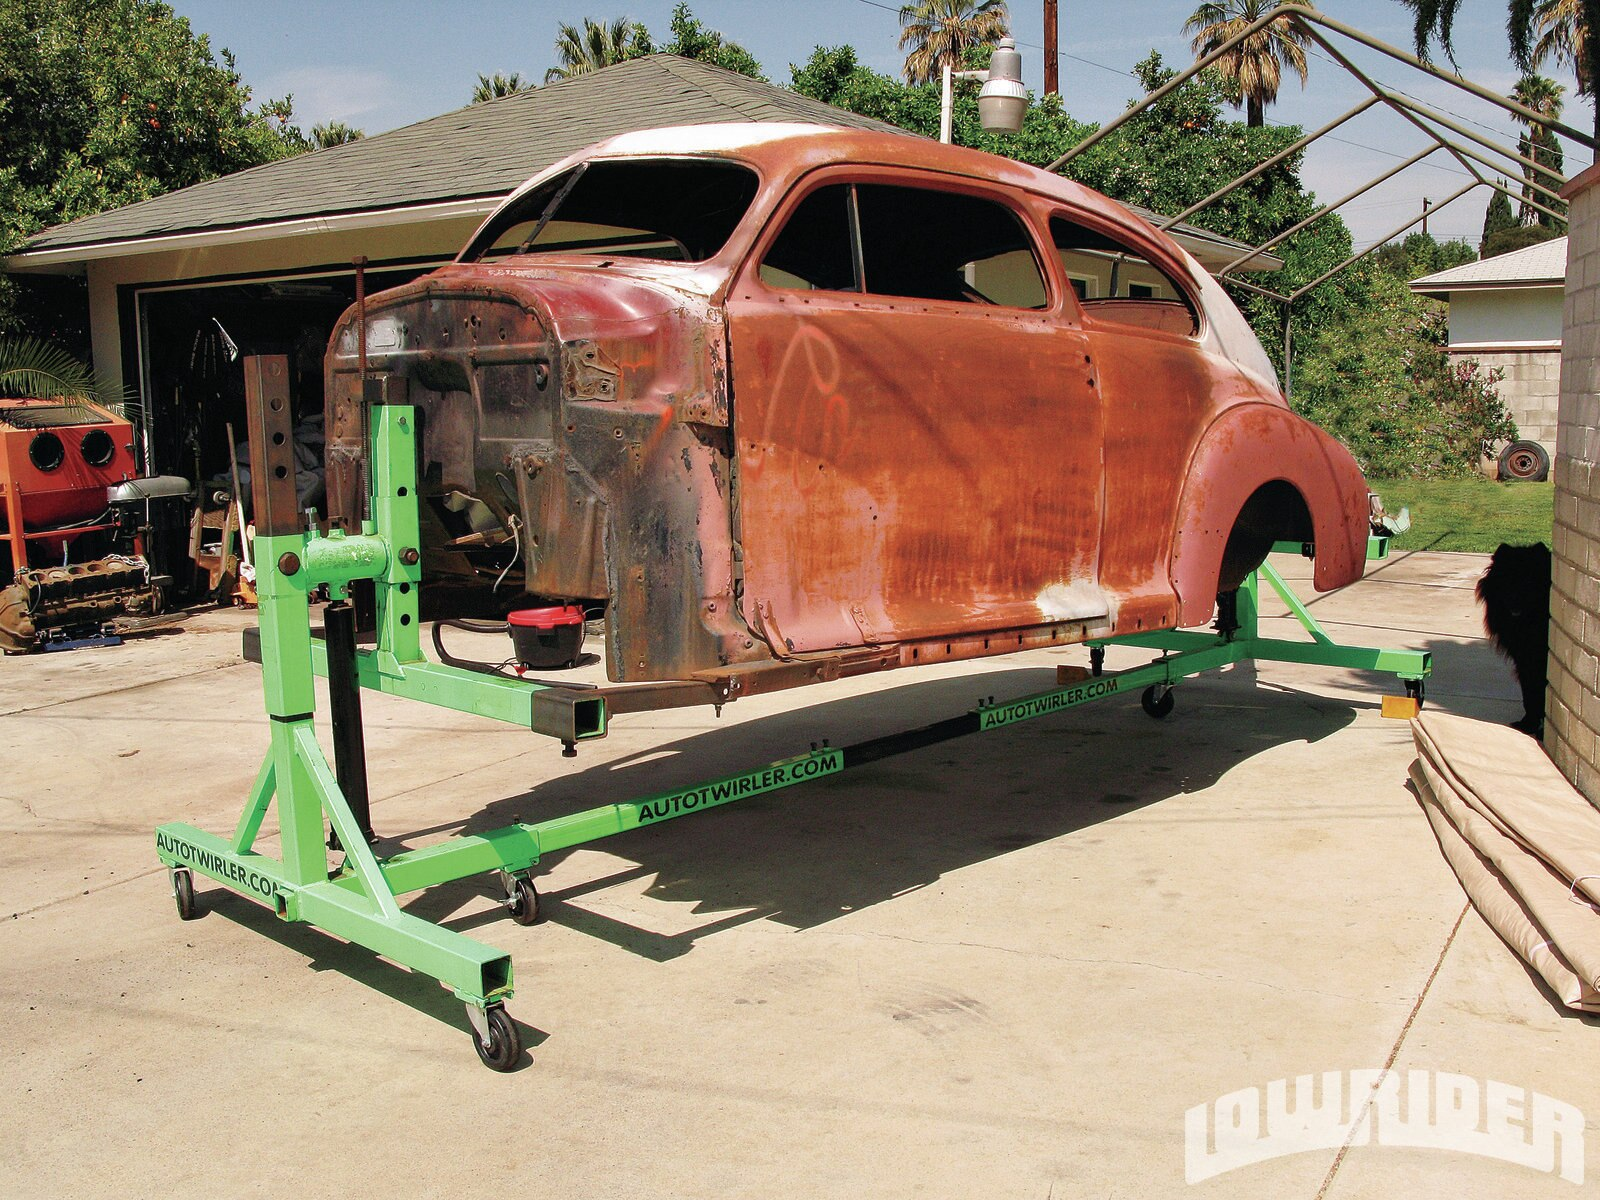 1208-lrmp-01-o-sheet-metal-repair-1947-chevrolet-fleetline-aero-sedan1